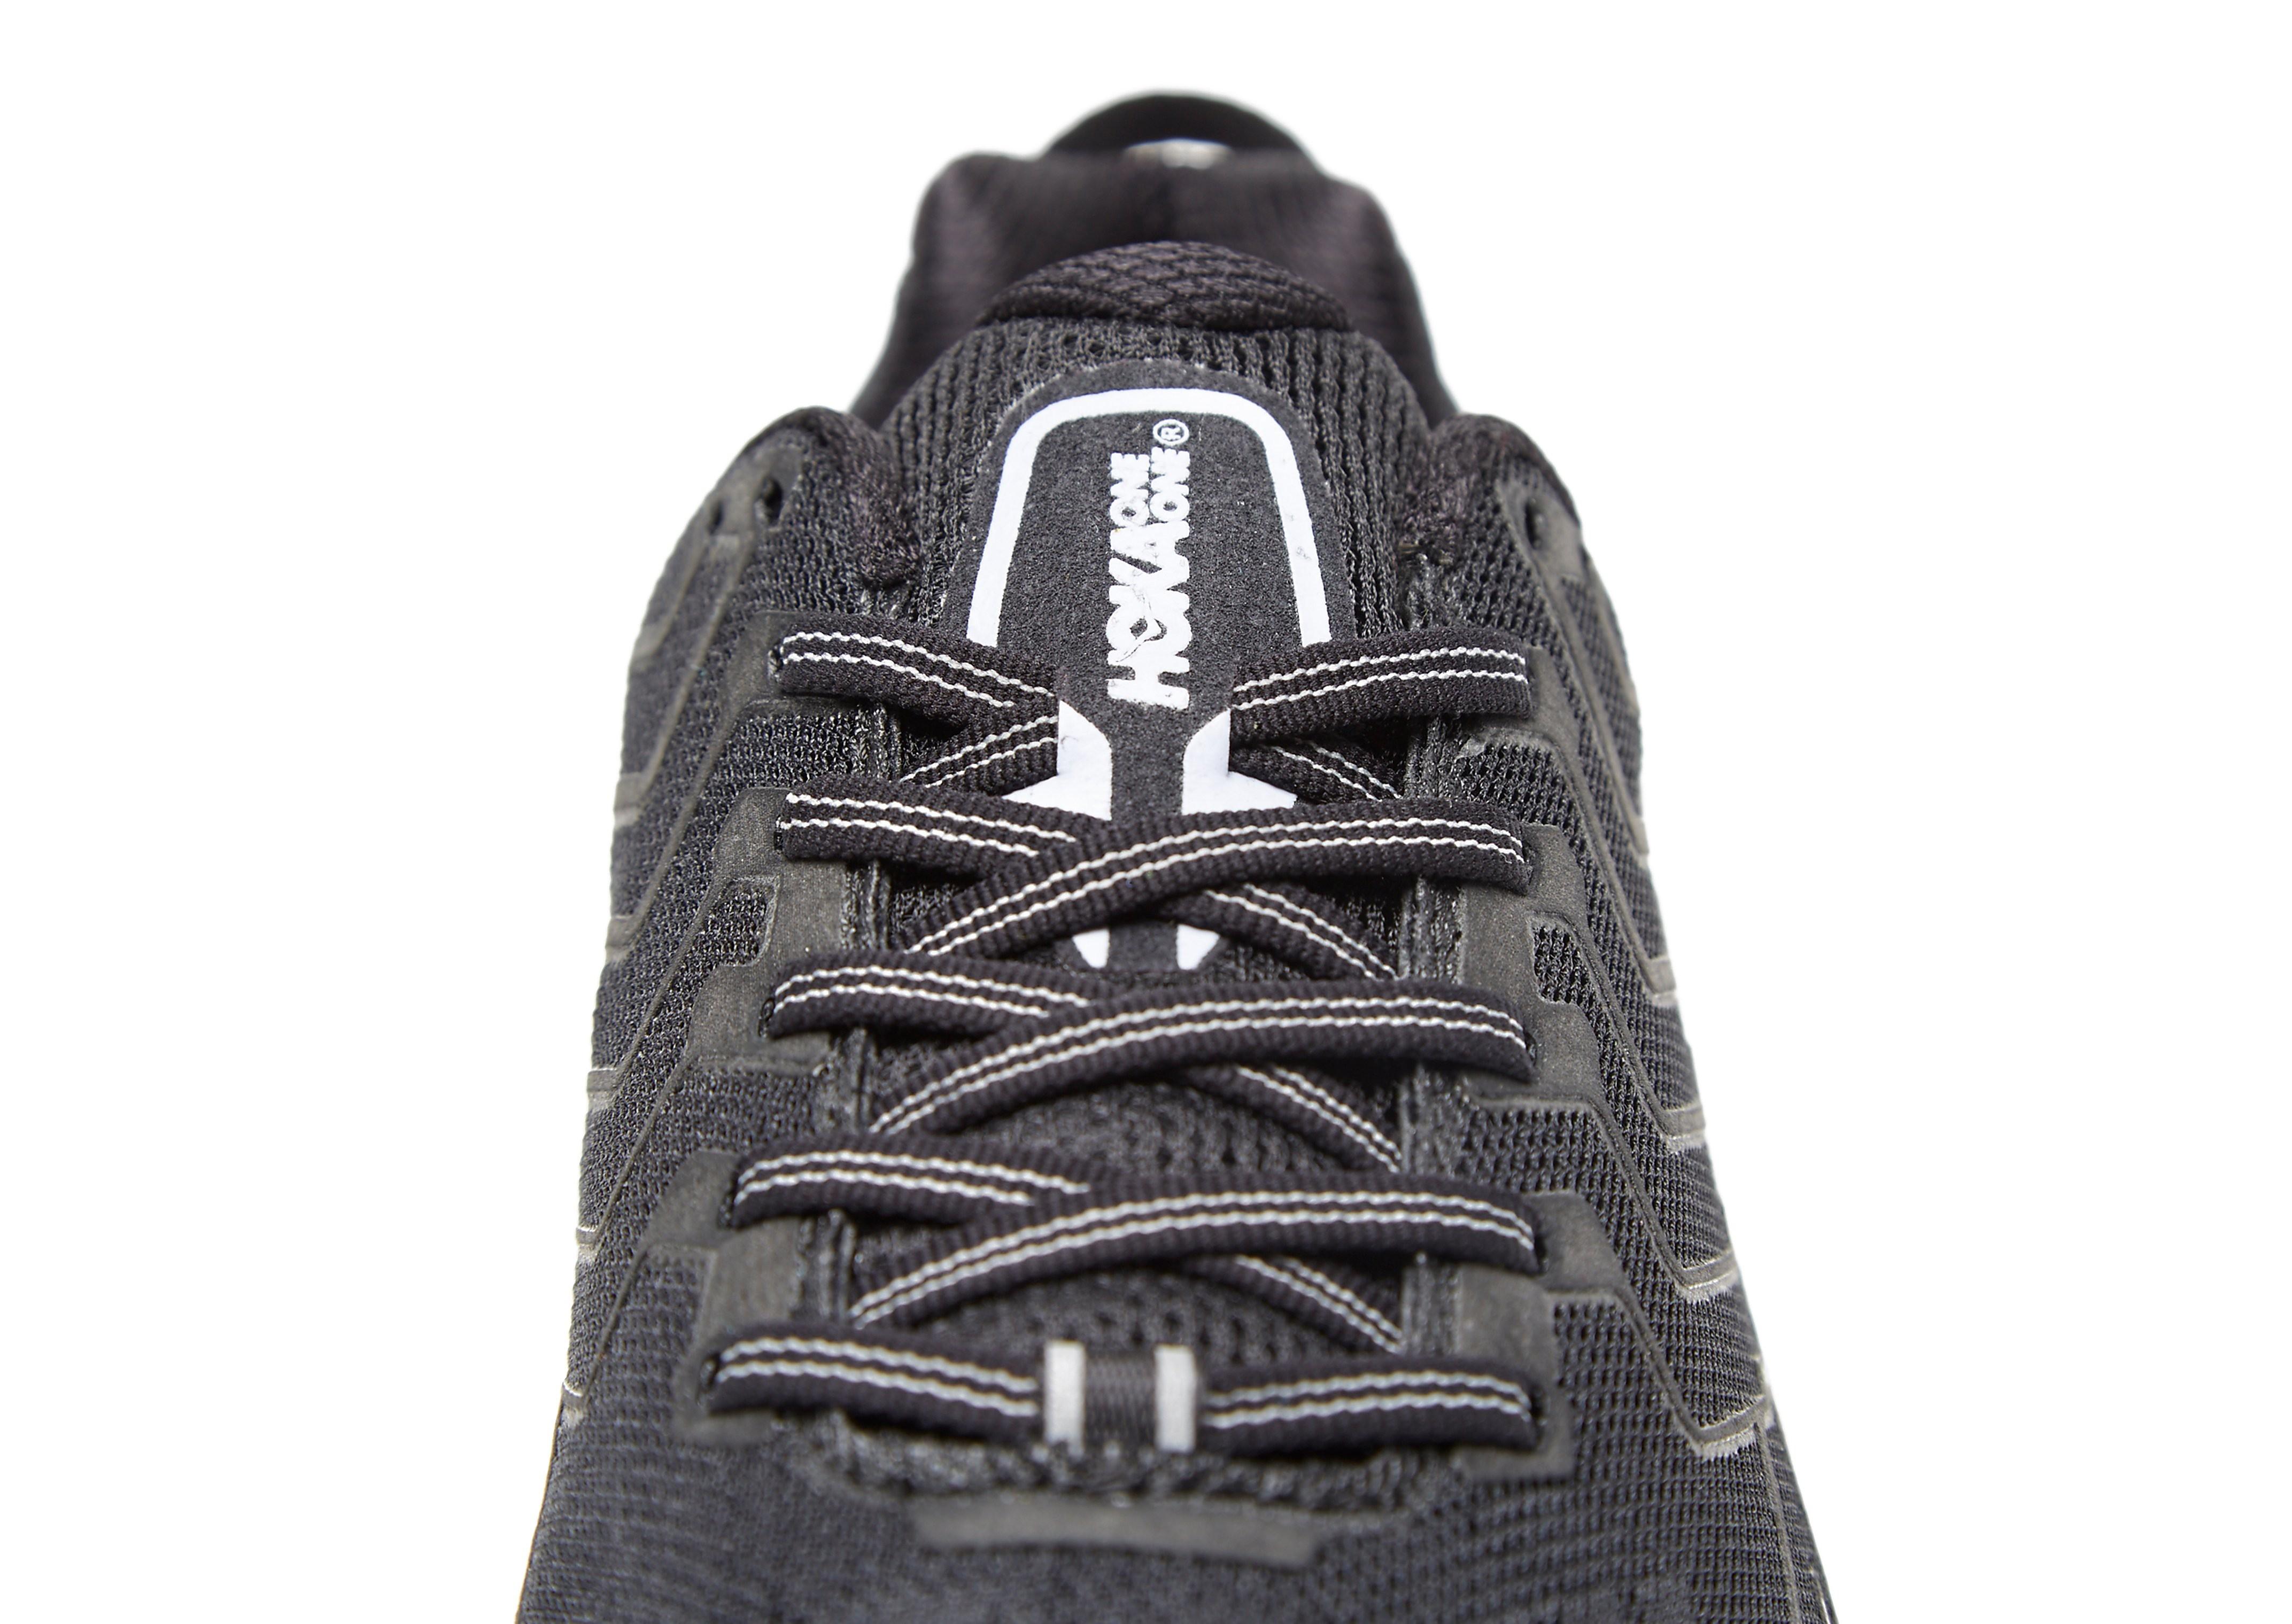 Hoka One One Clifton 4 Running Shoes Women's